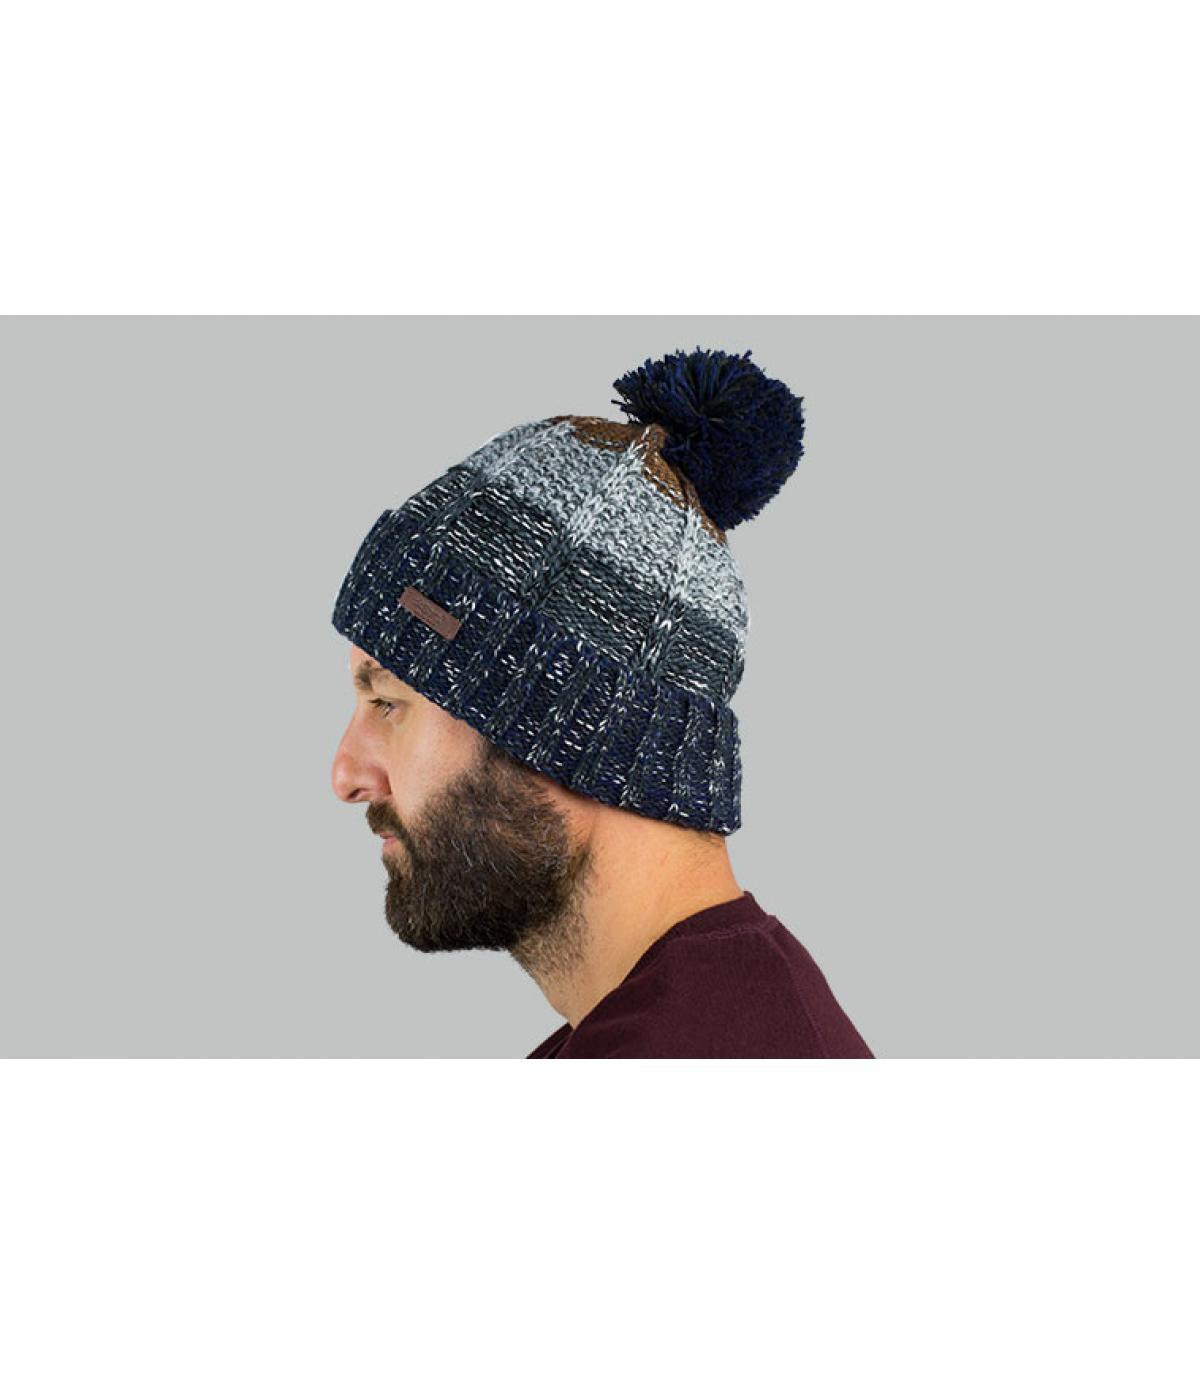 kwast hoed blauw grijze streep